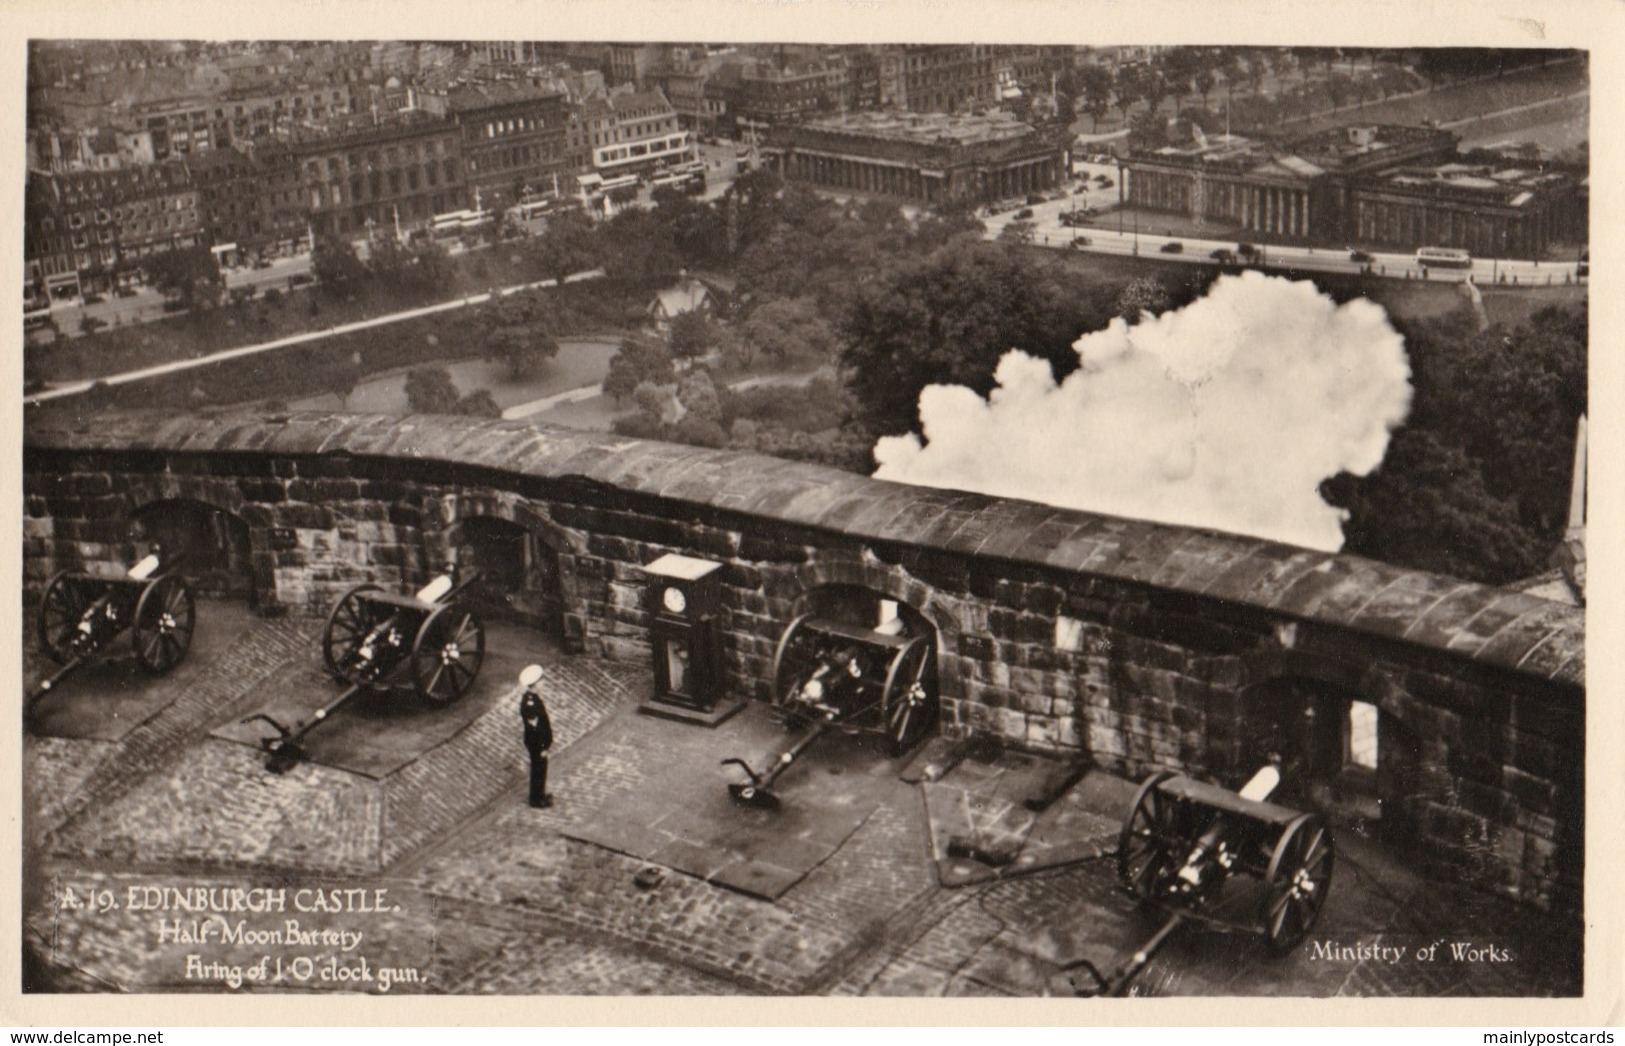 AL79 Edinburgh Castle, Half Moon Battery, Firing Of 1 O'clock Gun - Midlothian/ Edinburgh